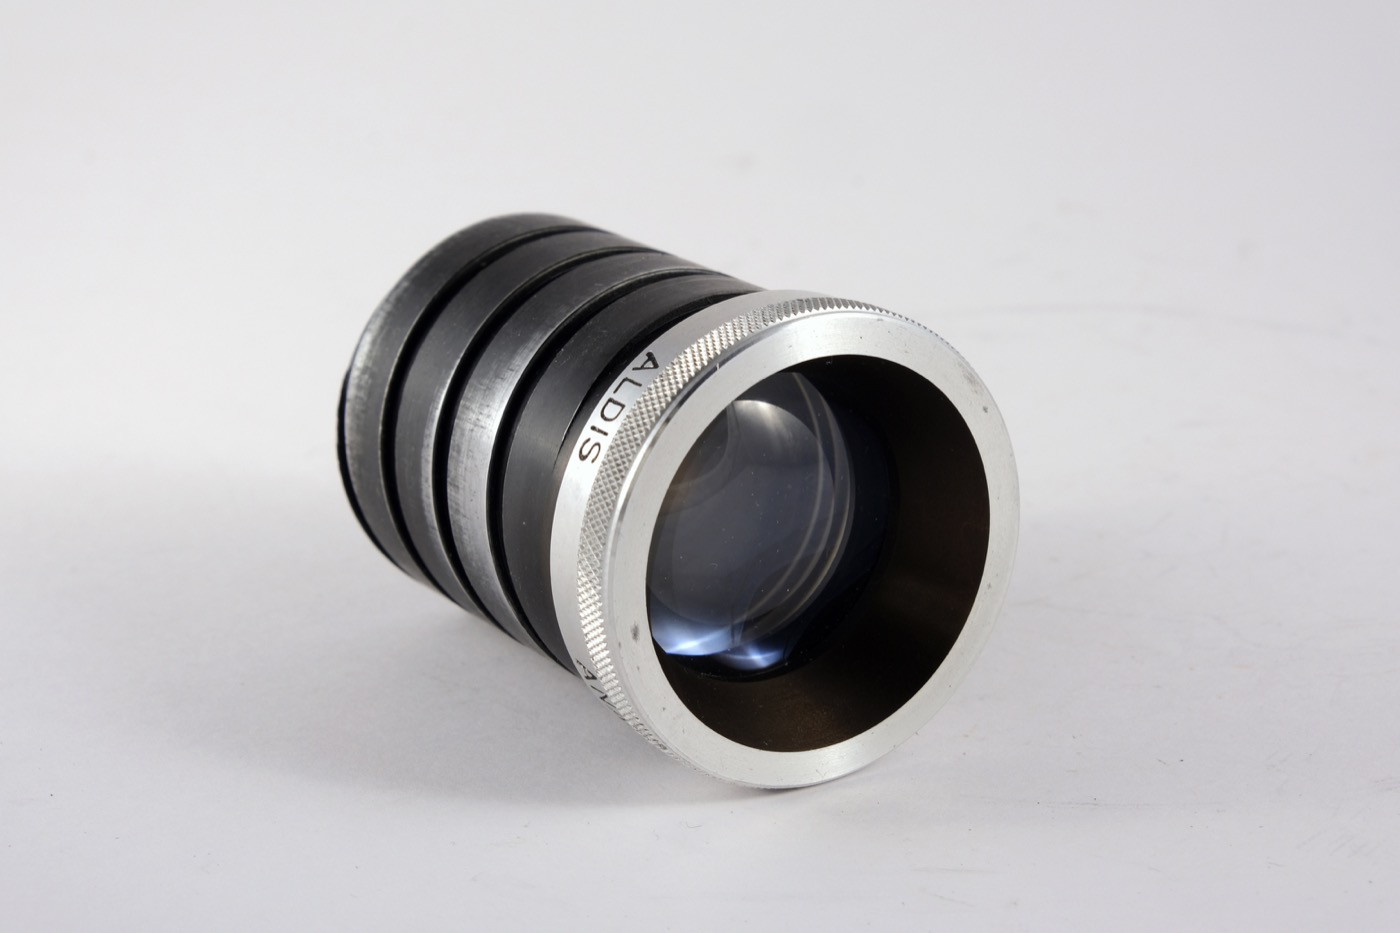 Aldis anastigmat projector lens